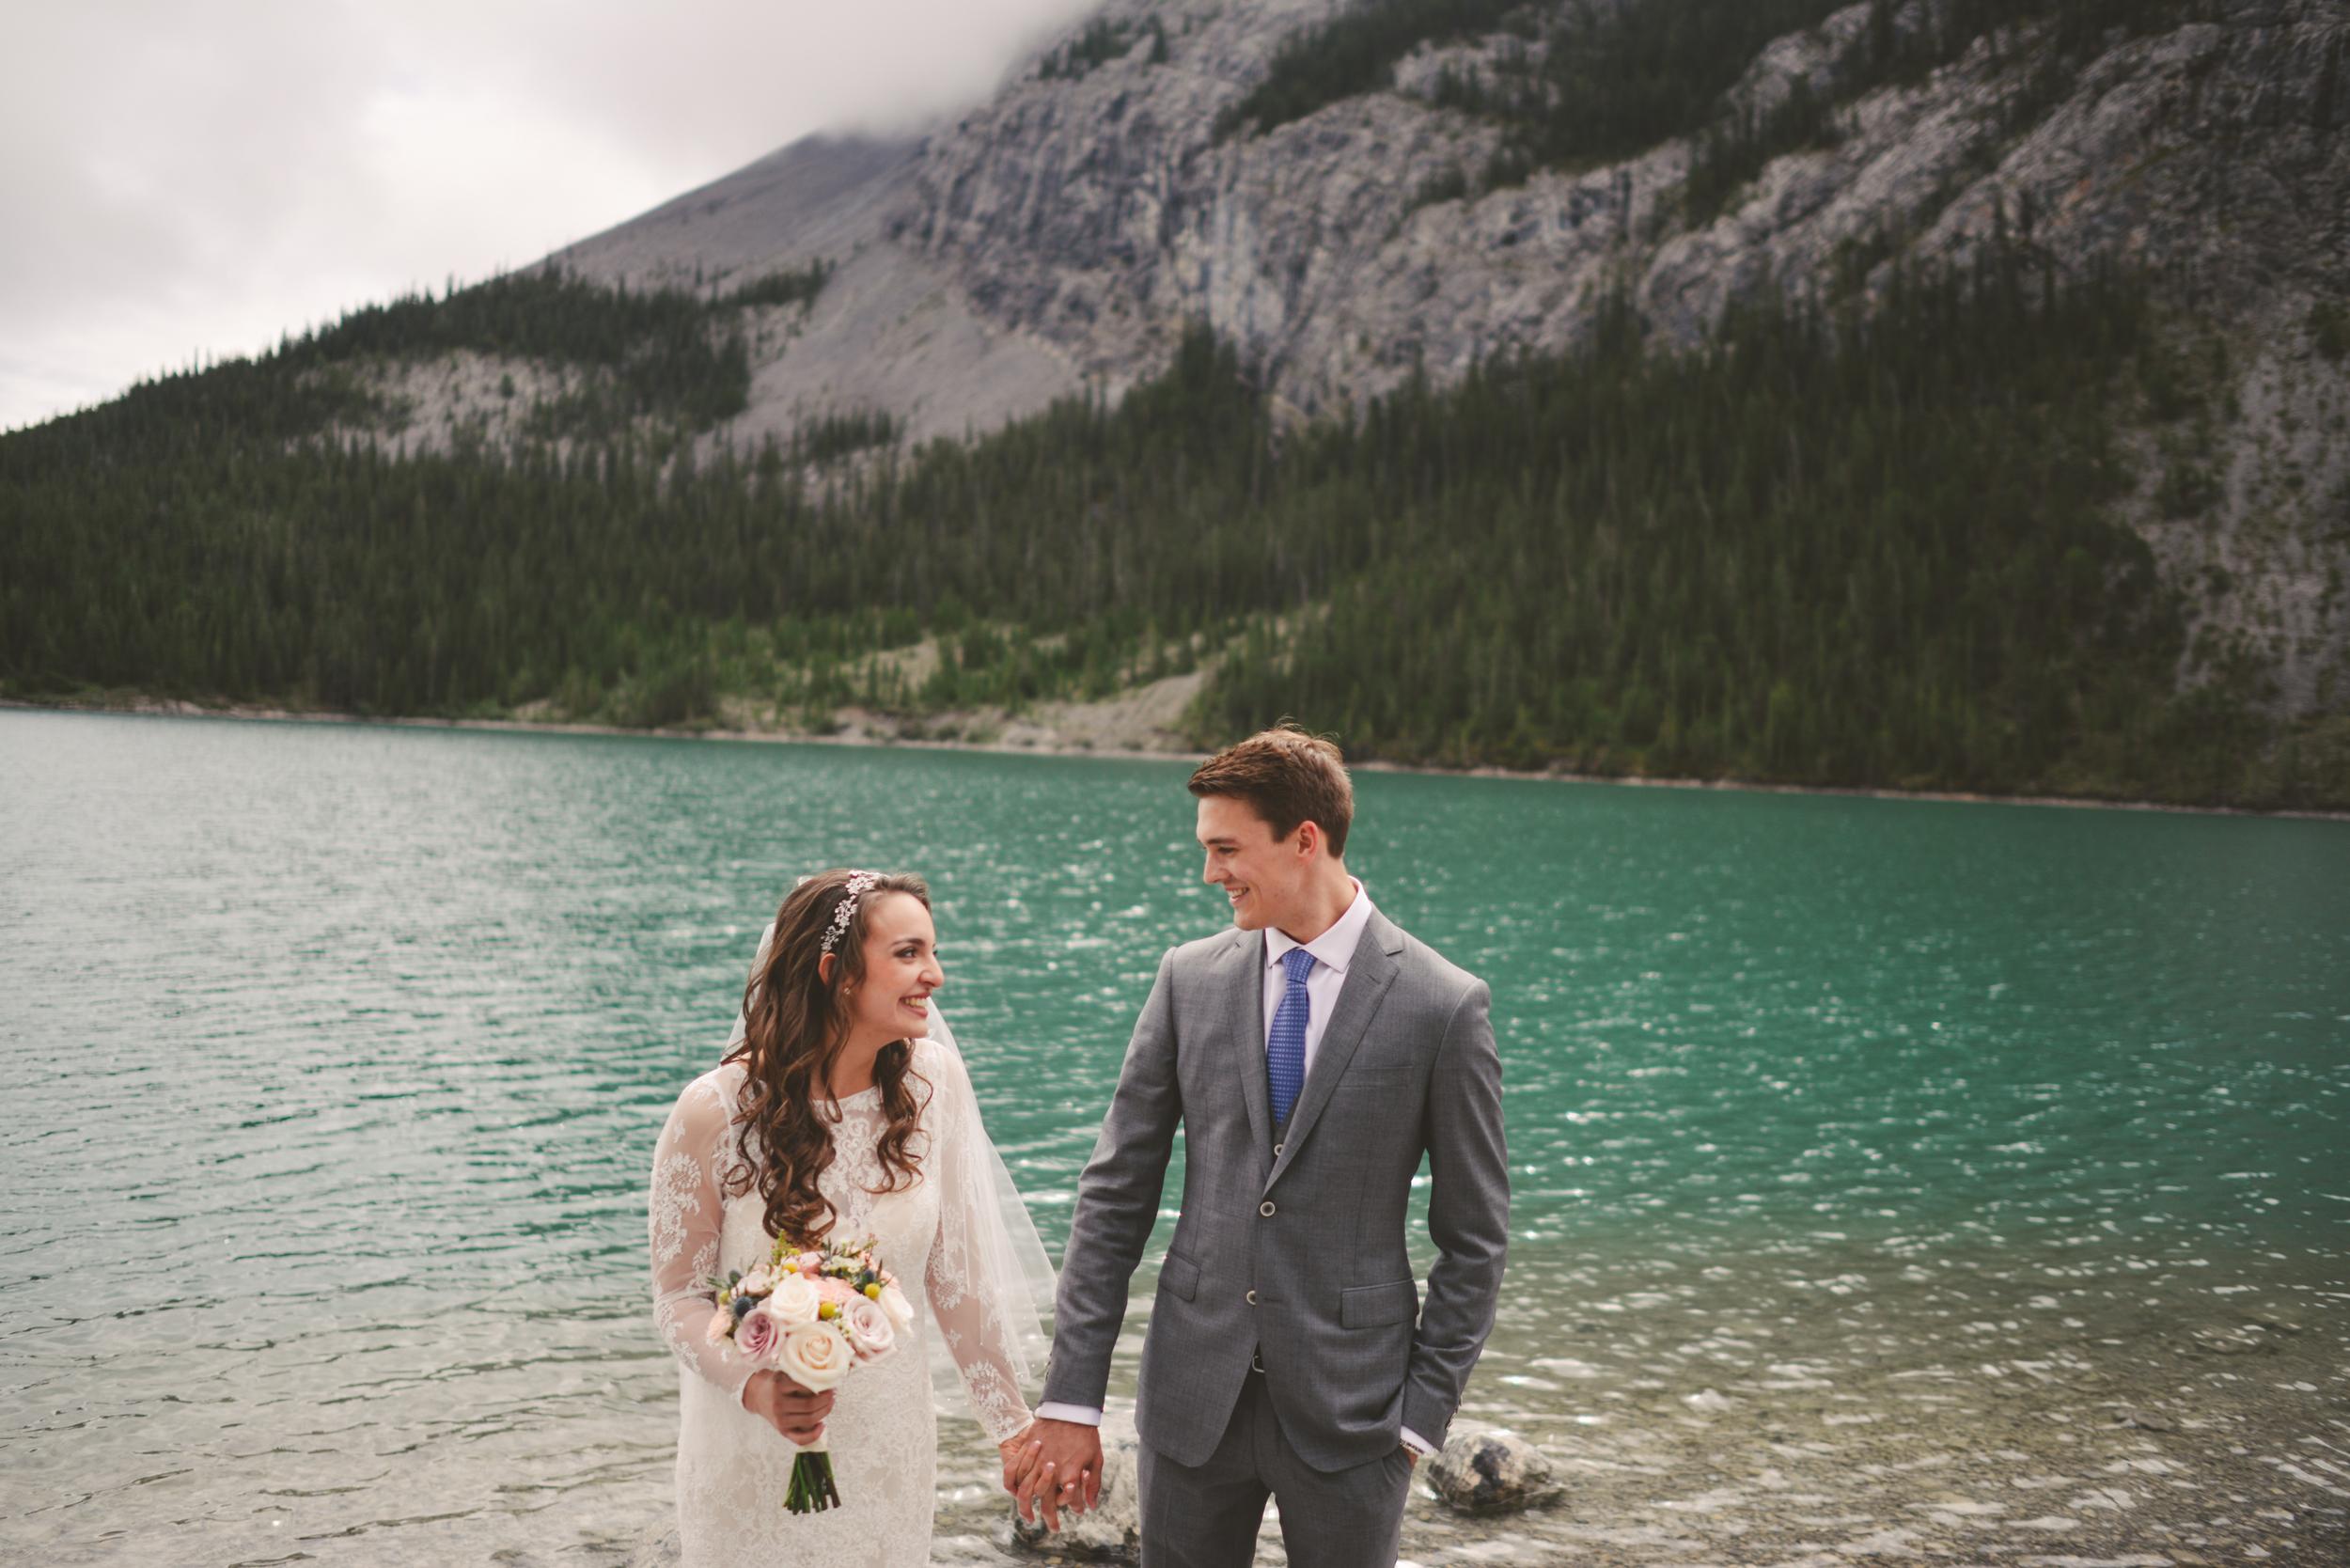 zach & bruna // married